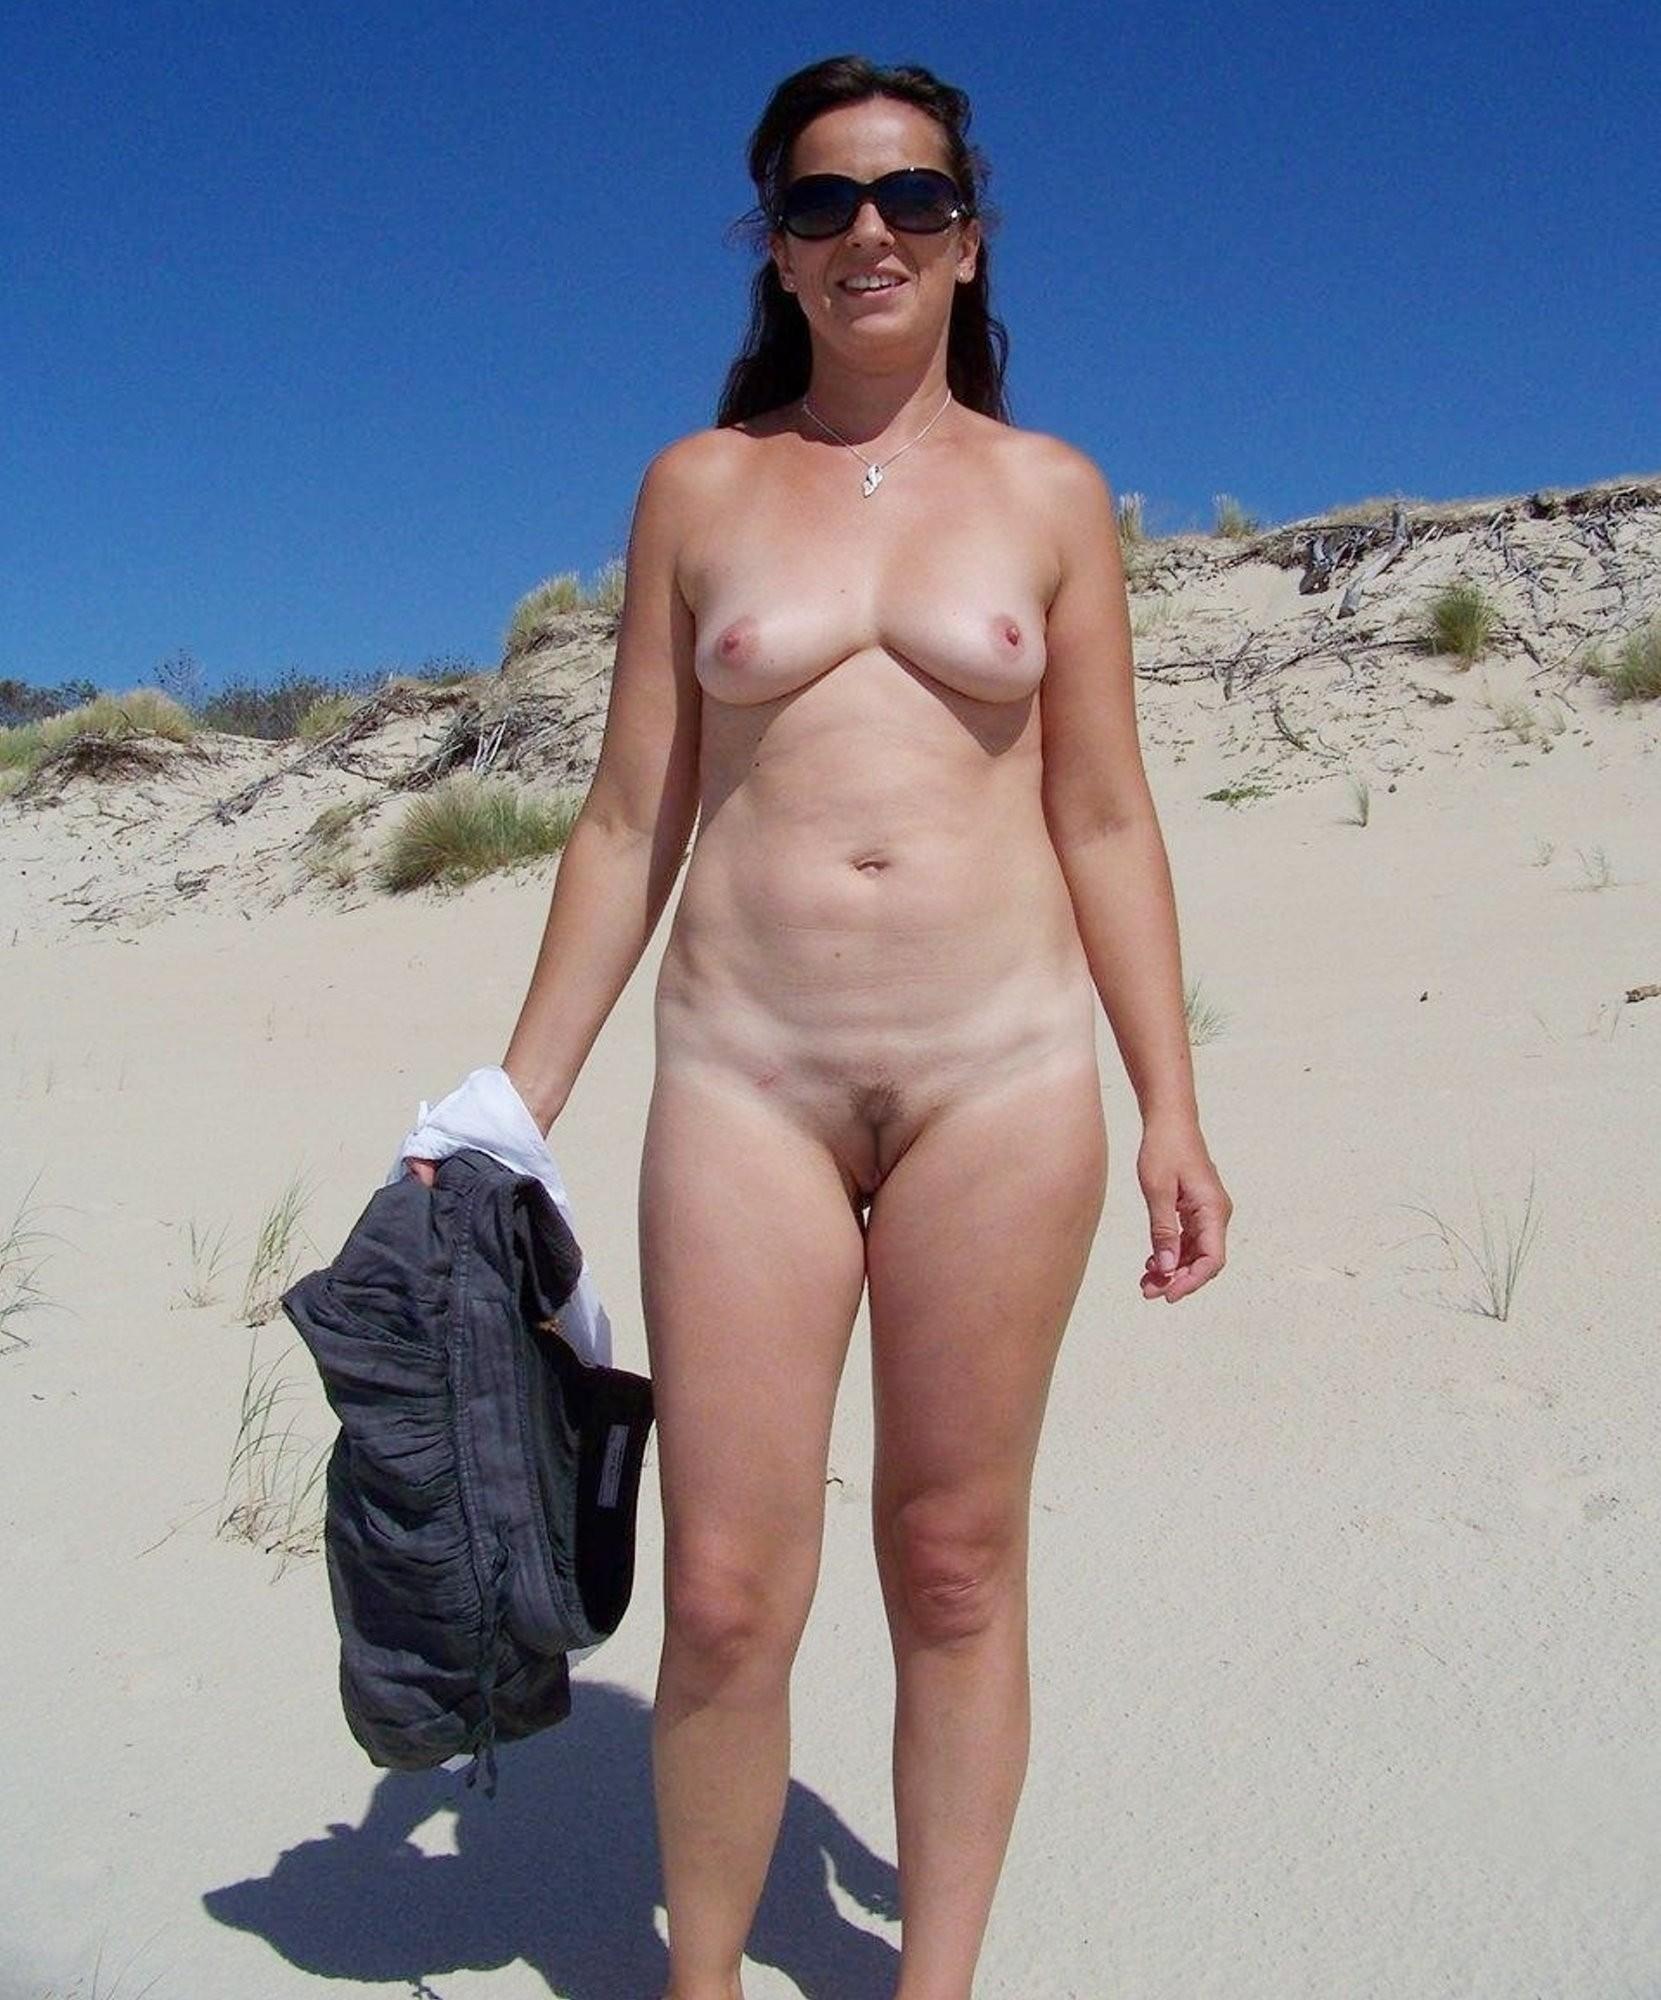 Deja tits amateur mature nude women on the beach virgin porn topless